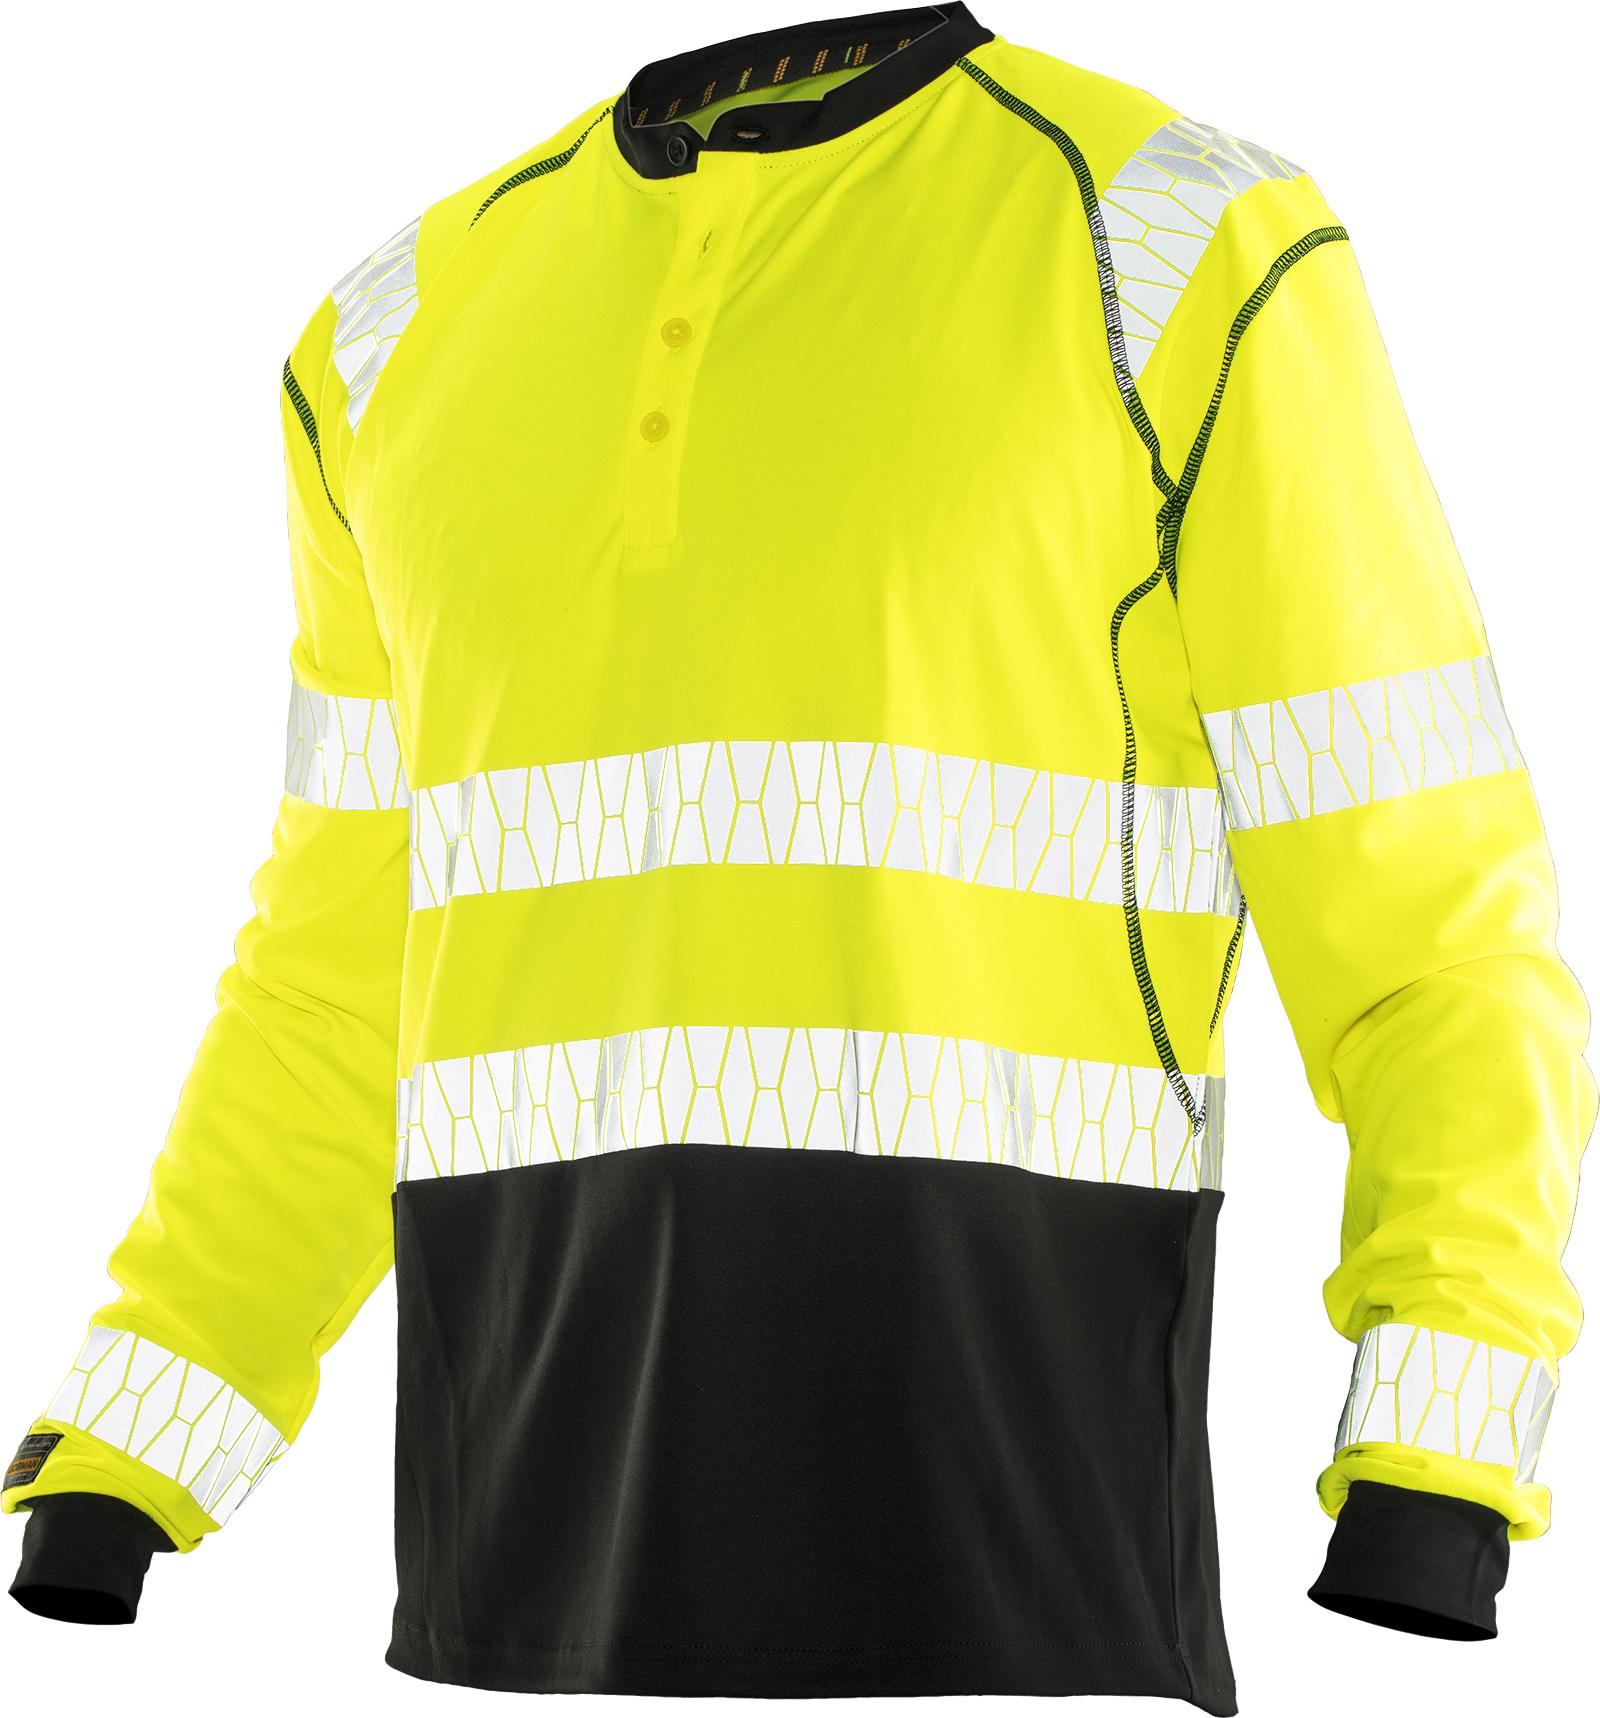 5598 T-shirt manches longues anti-UV Hi-Vis 3XL jaune/noir